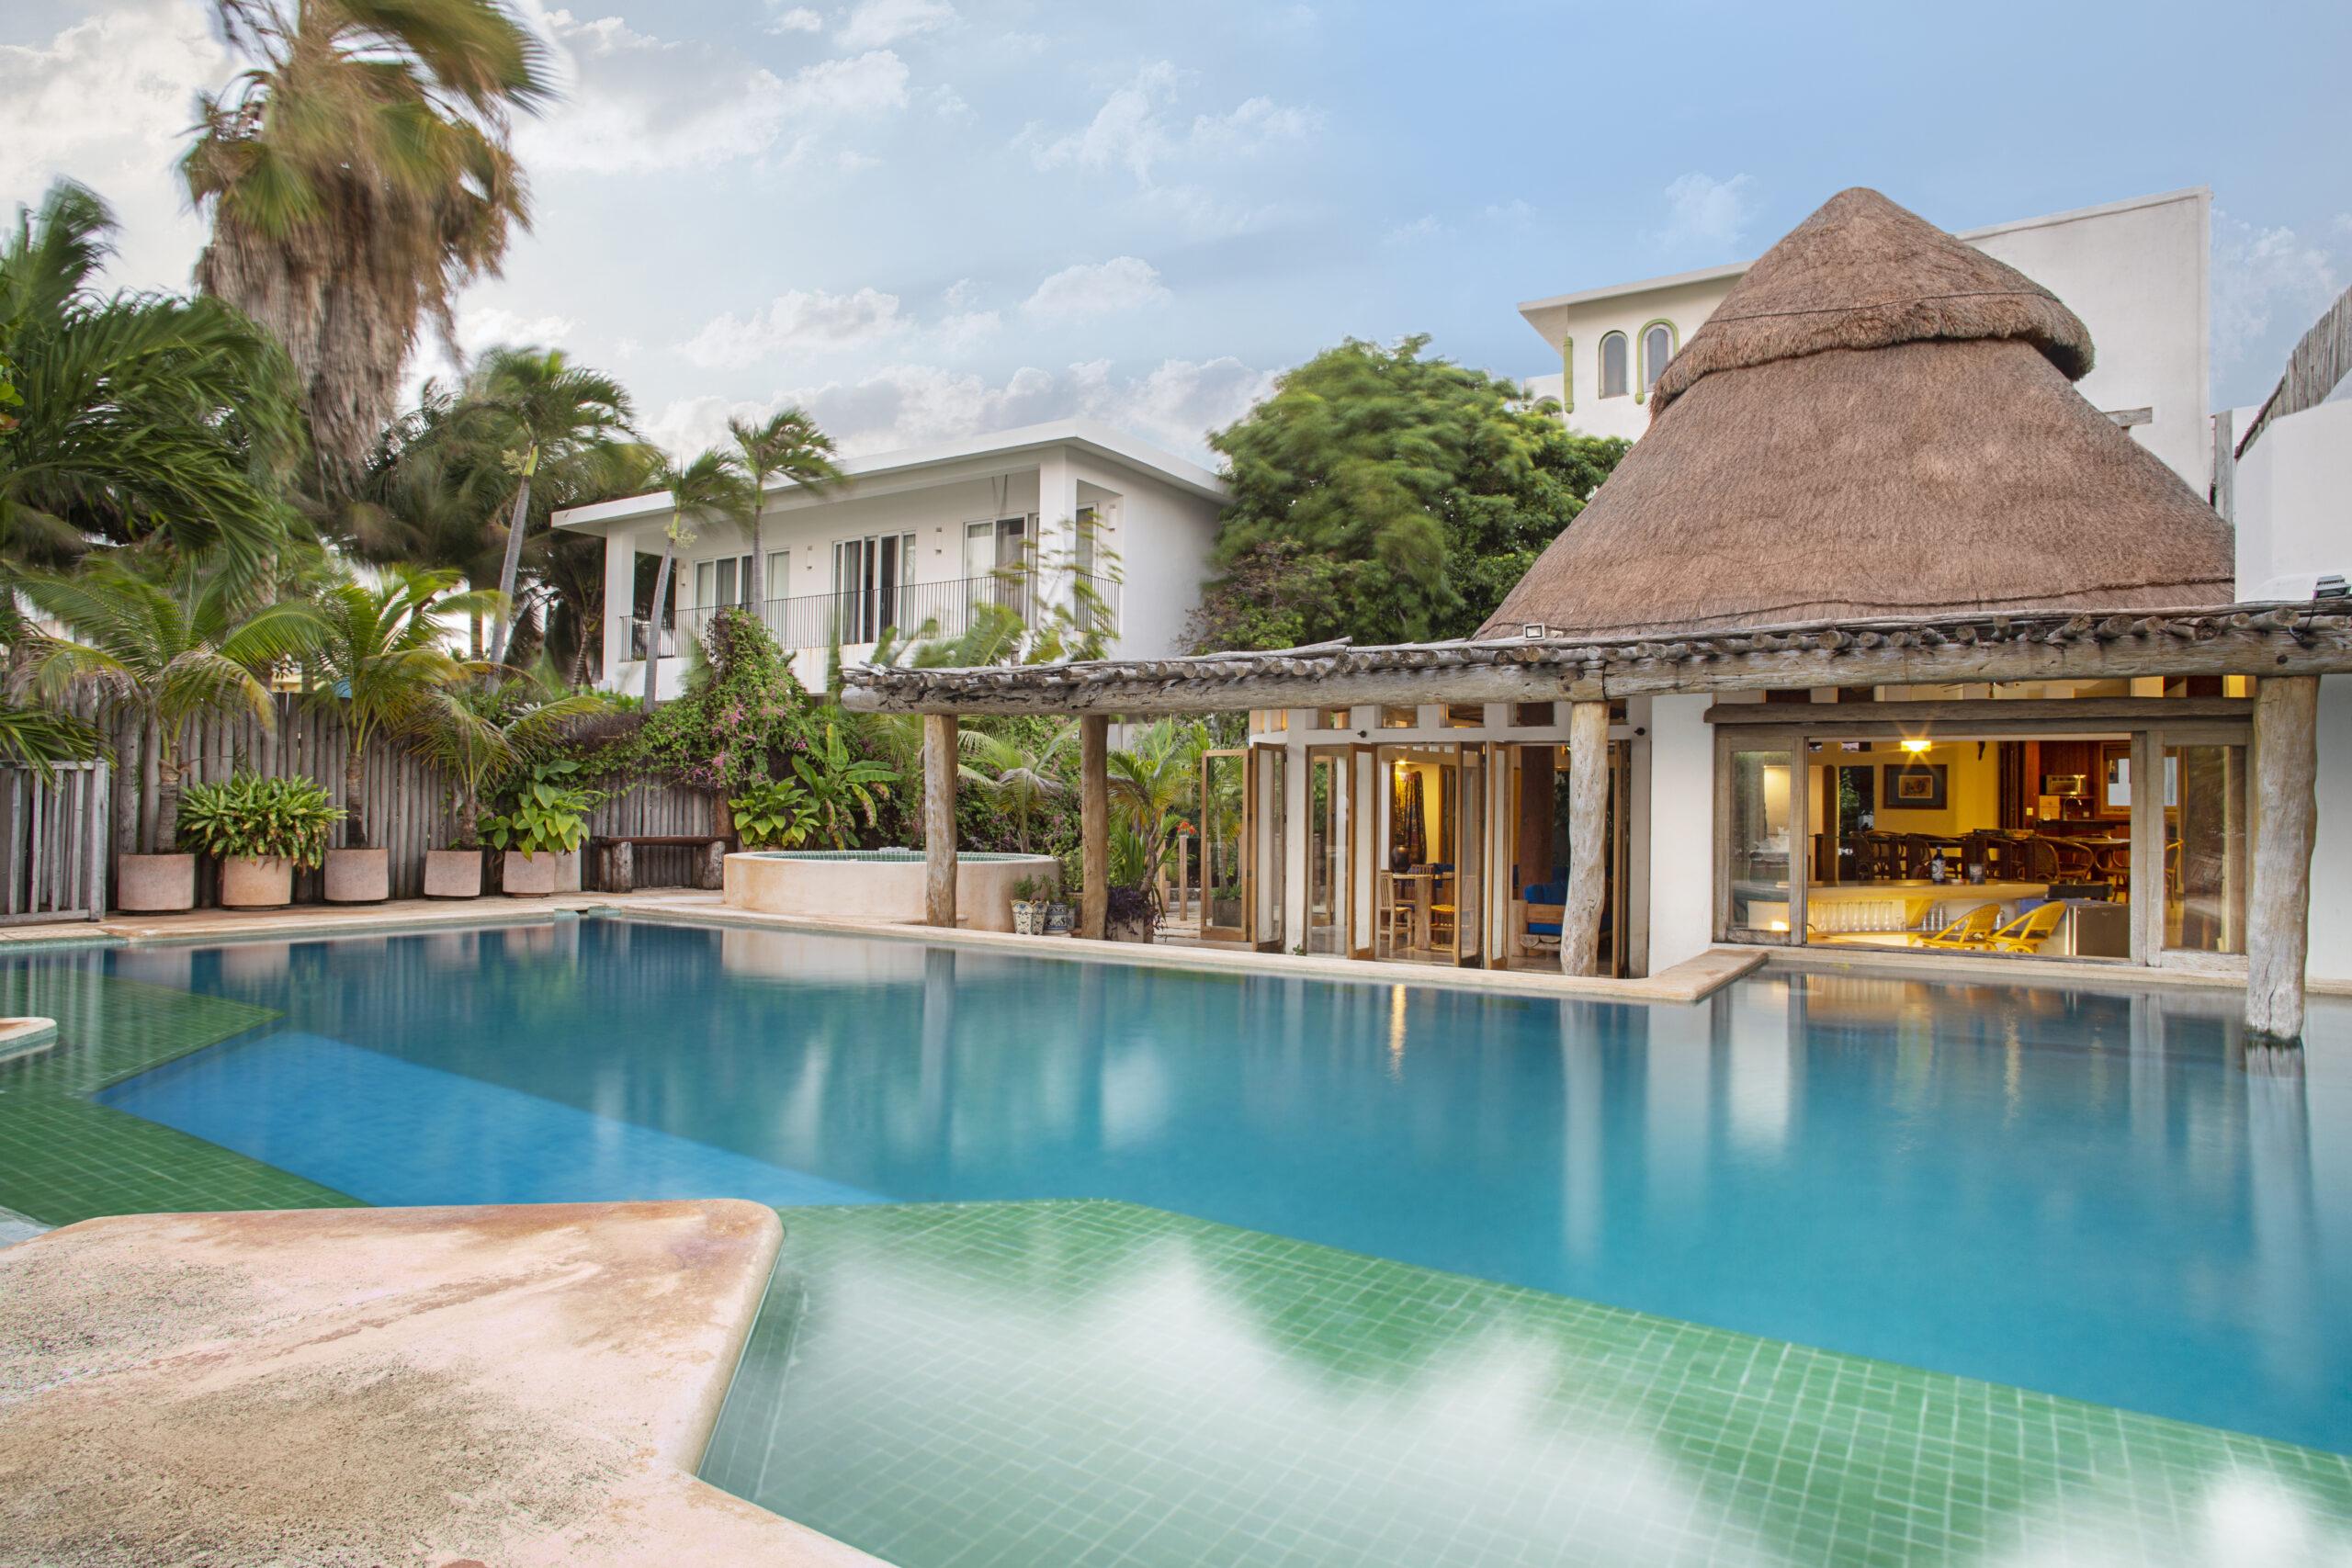 Casa en venta en Zona Hotelera frente a la laguna